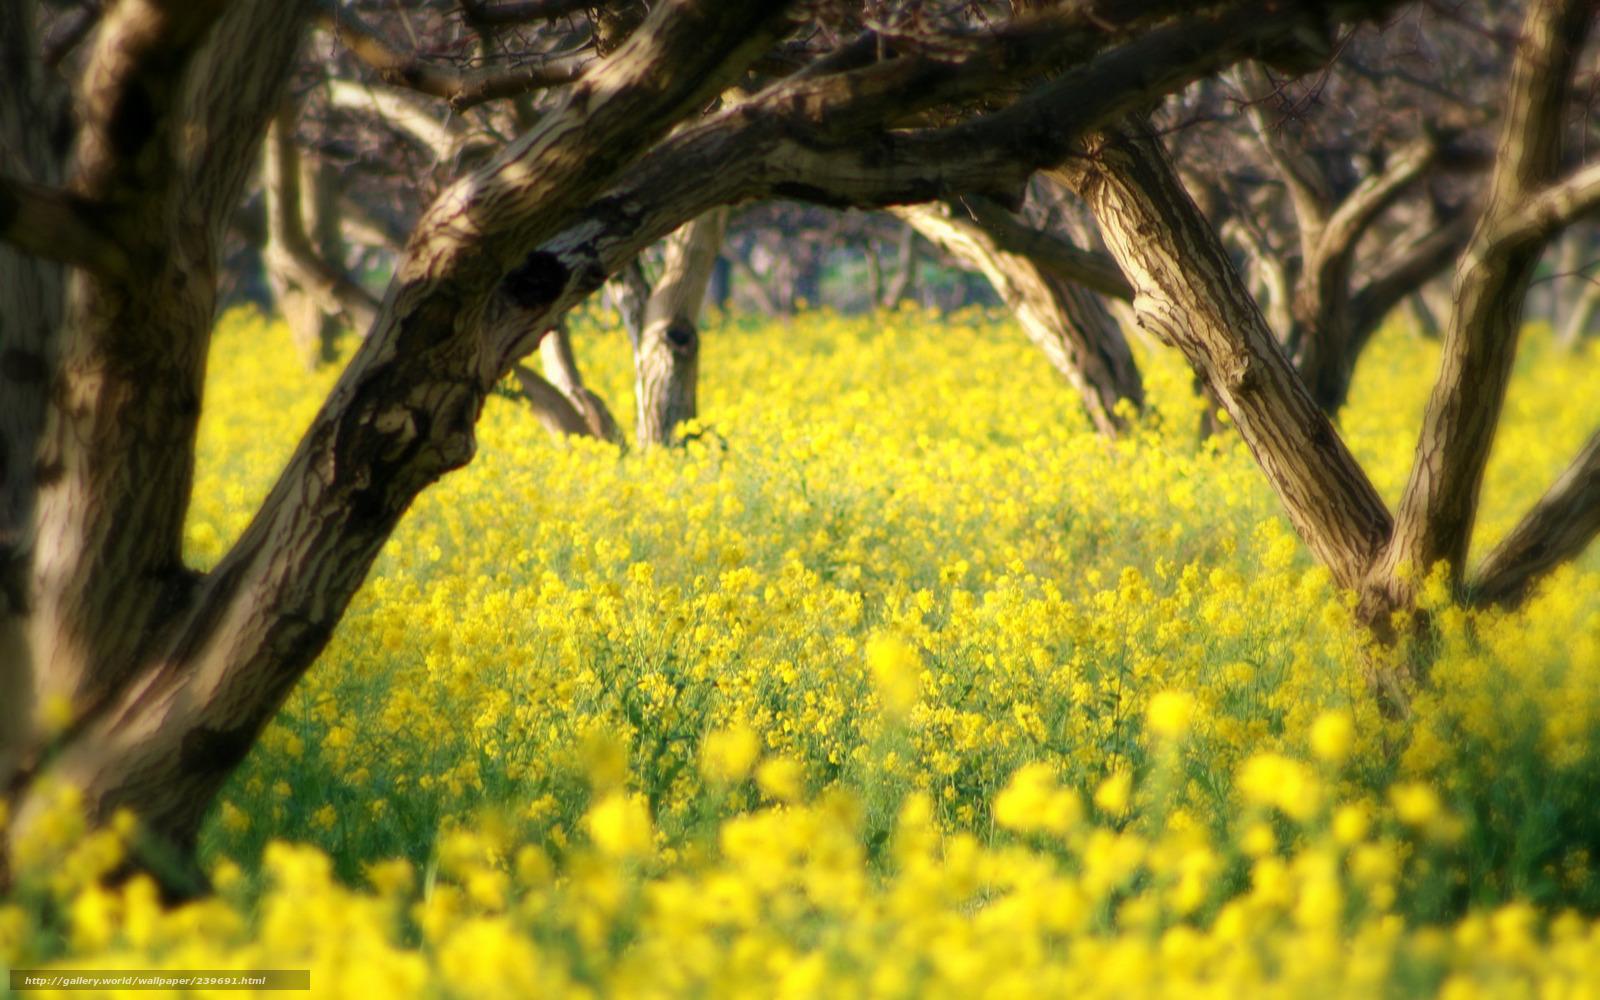 Léto, stromy, květiny, krása, něha, 2560x1600 obrázek / příroda